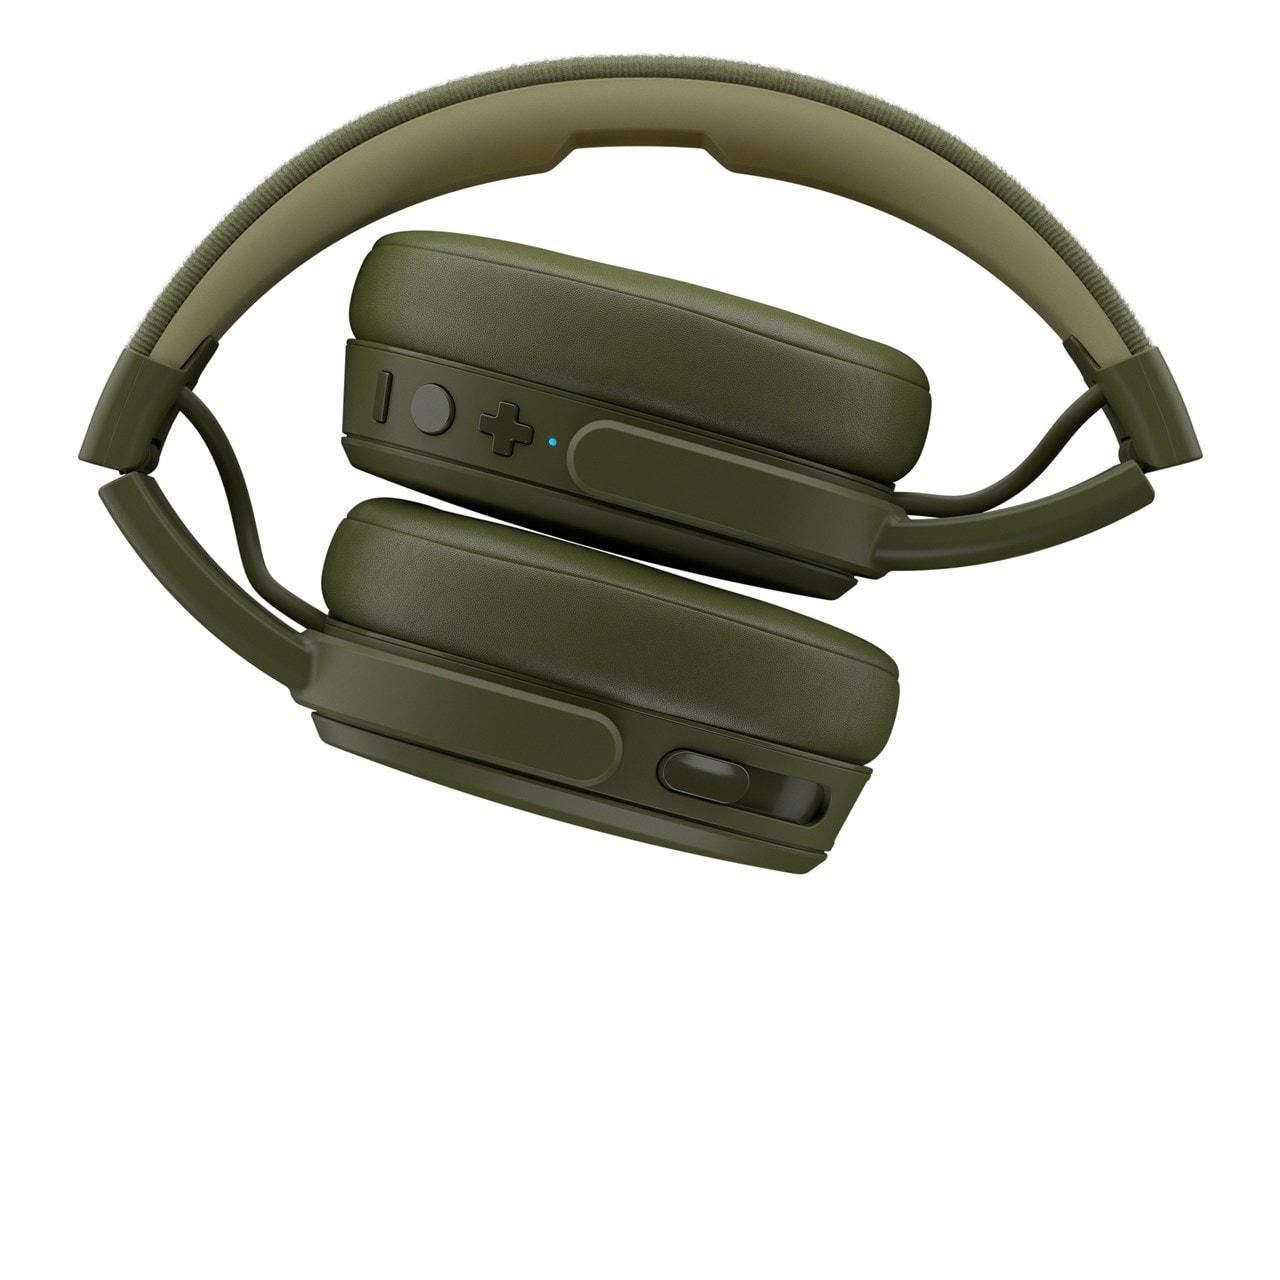 Skullcandy Crusher Moss/Olive/Yellow Bluetooth Headphones - 4